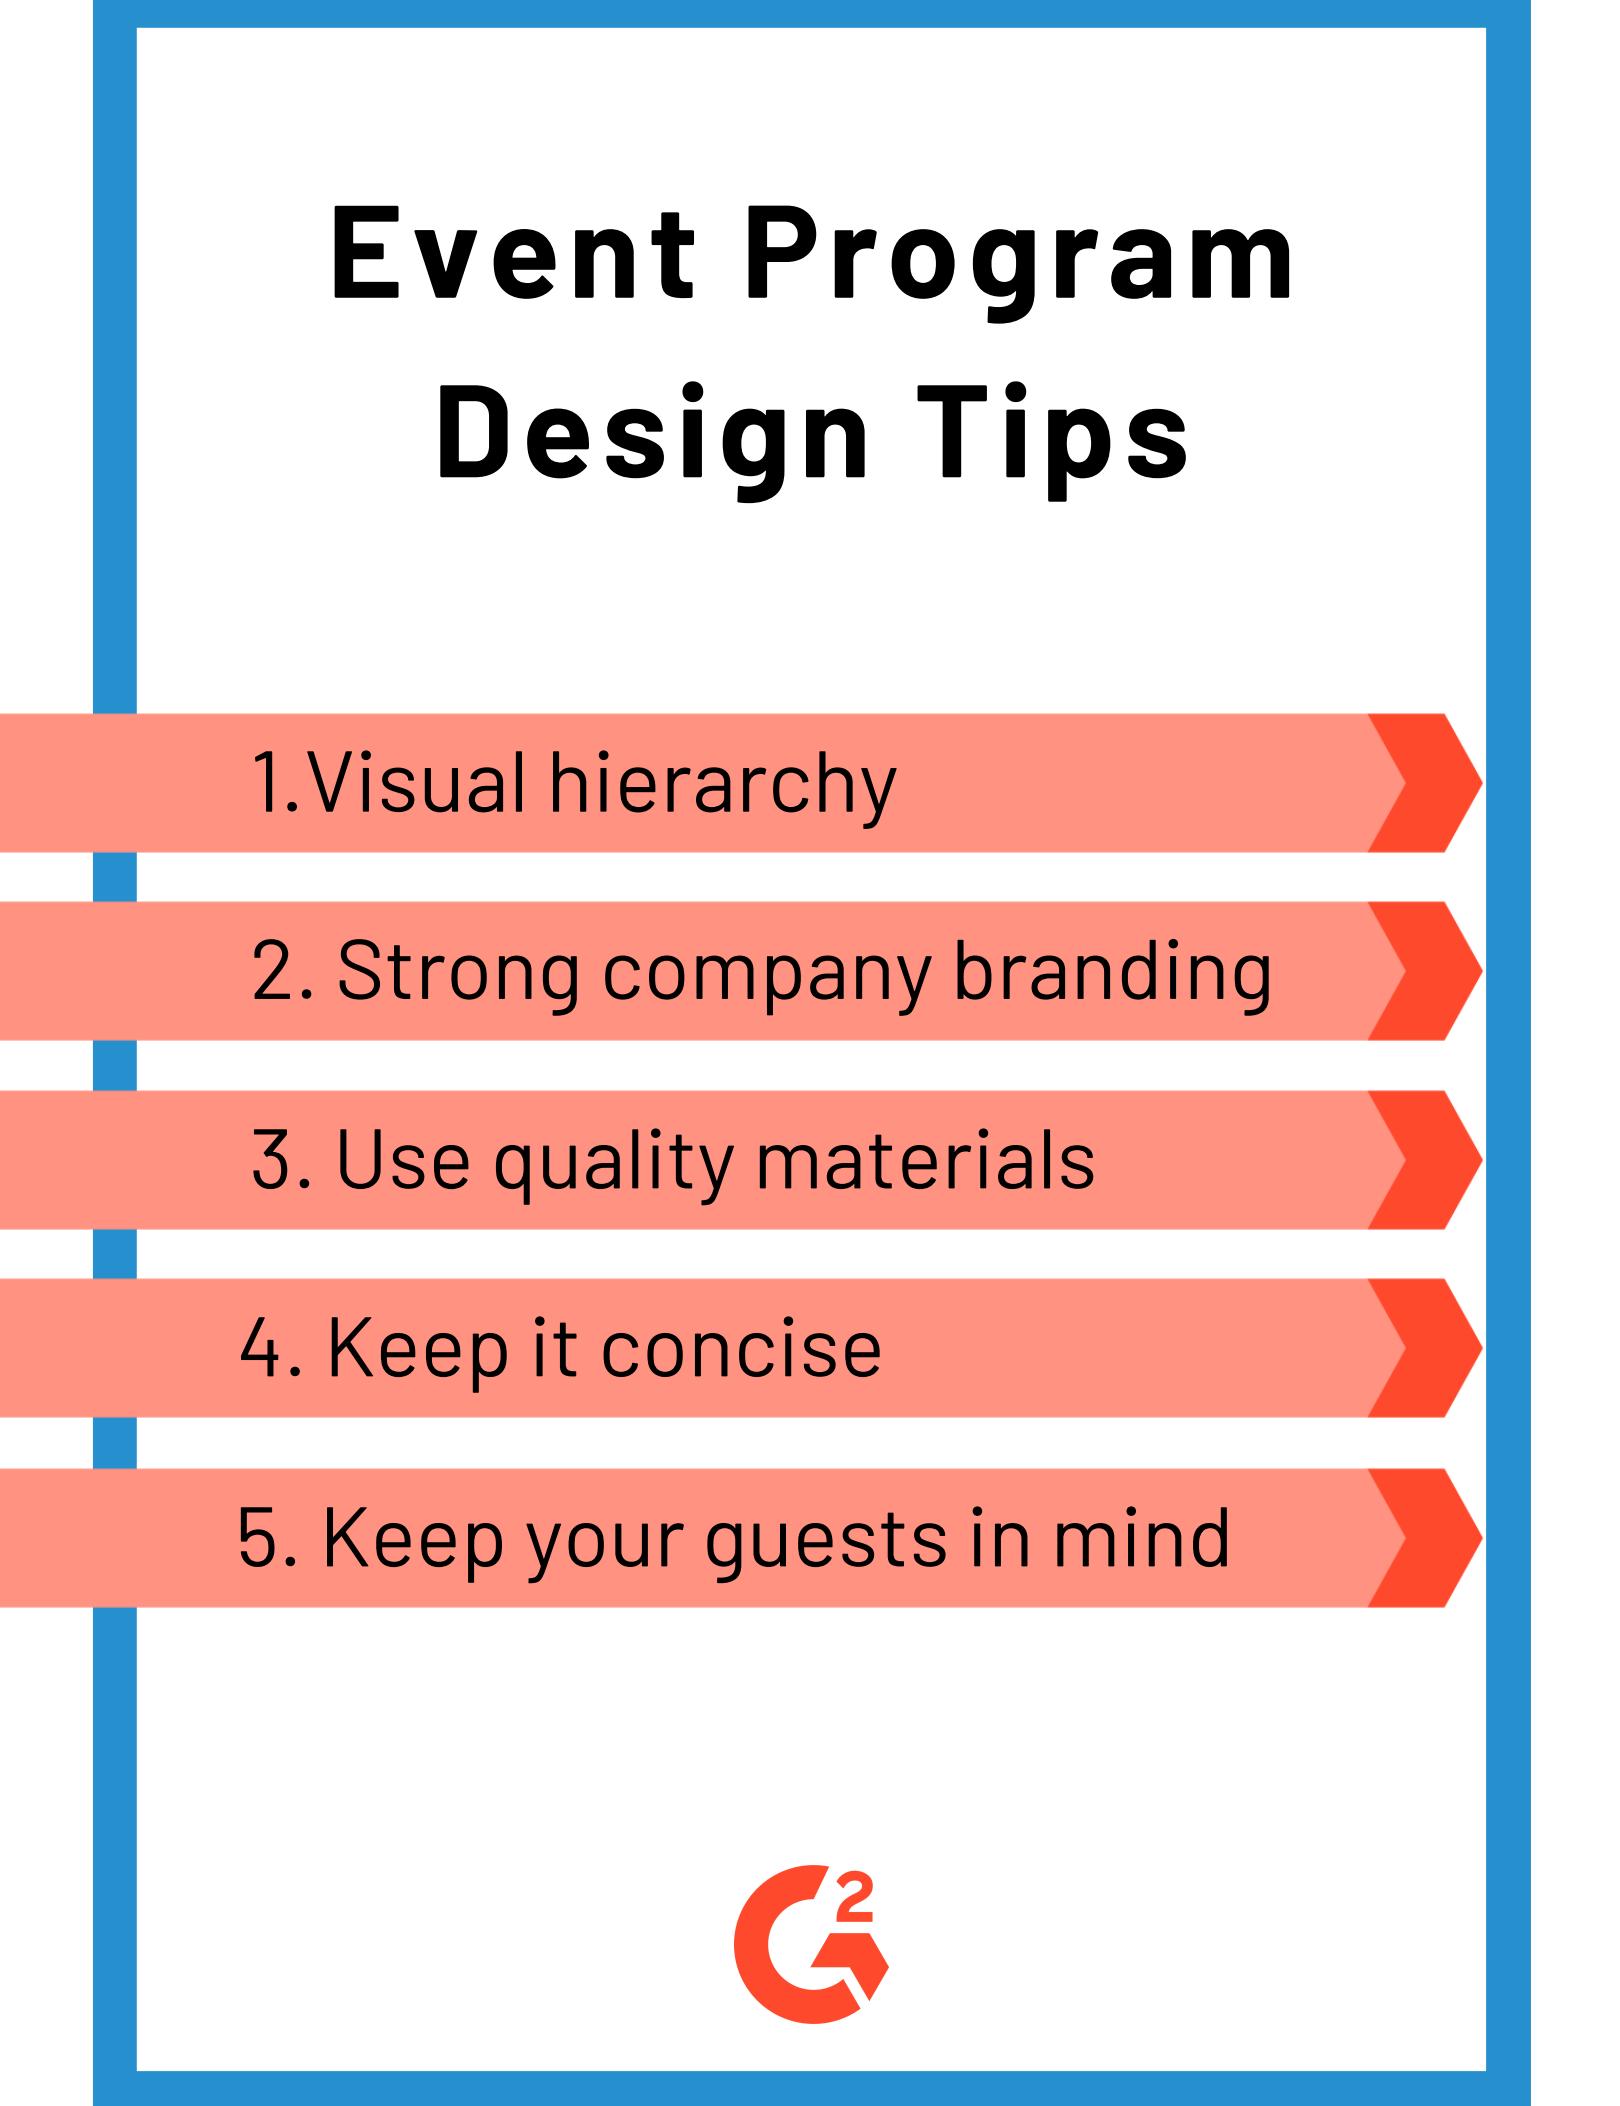 Event Program tips